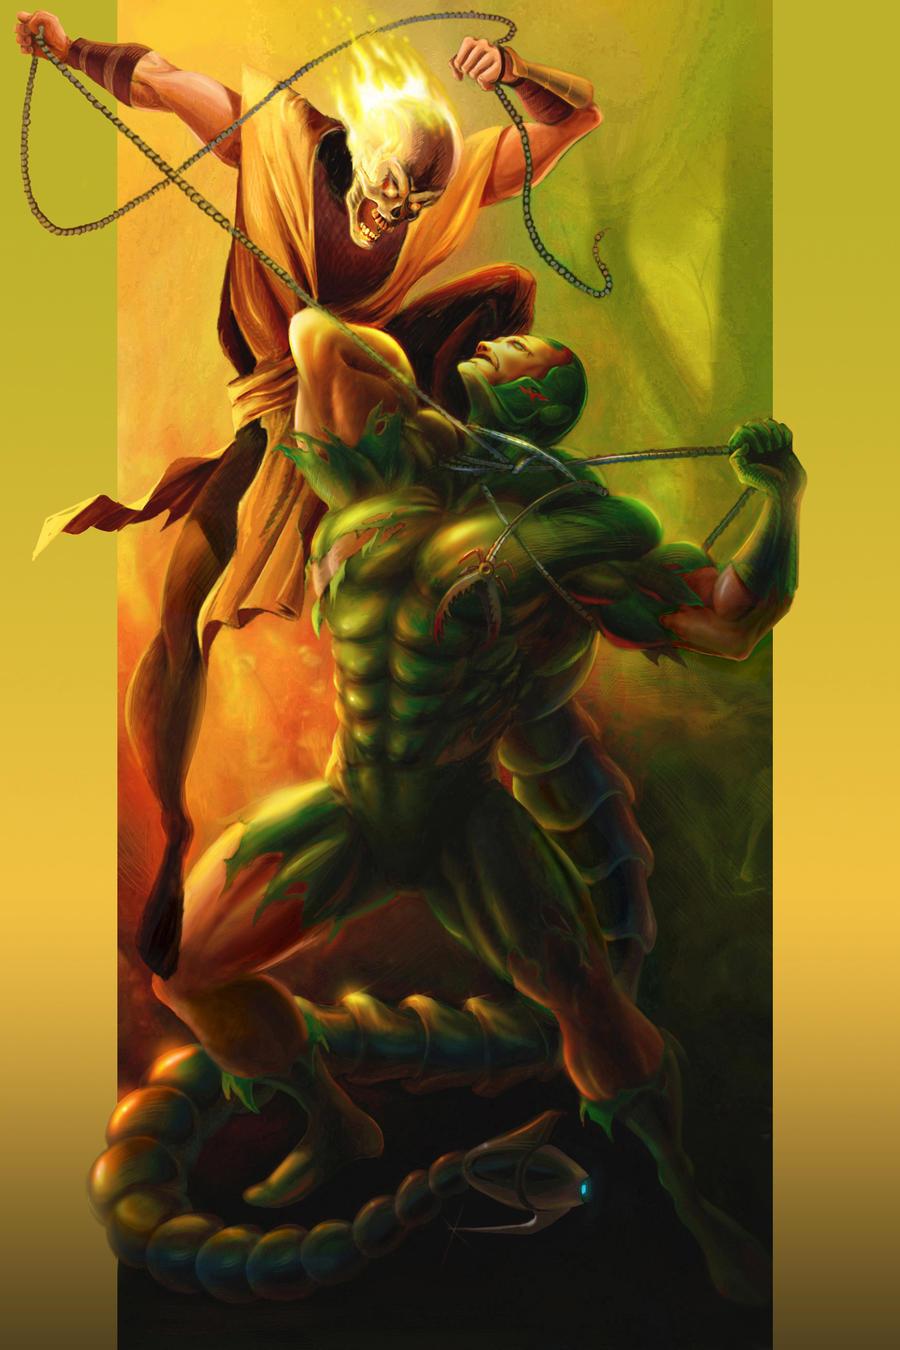 Scorpion Vs Scorpion by Goshadude89 on DeviantArt